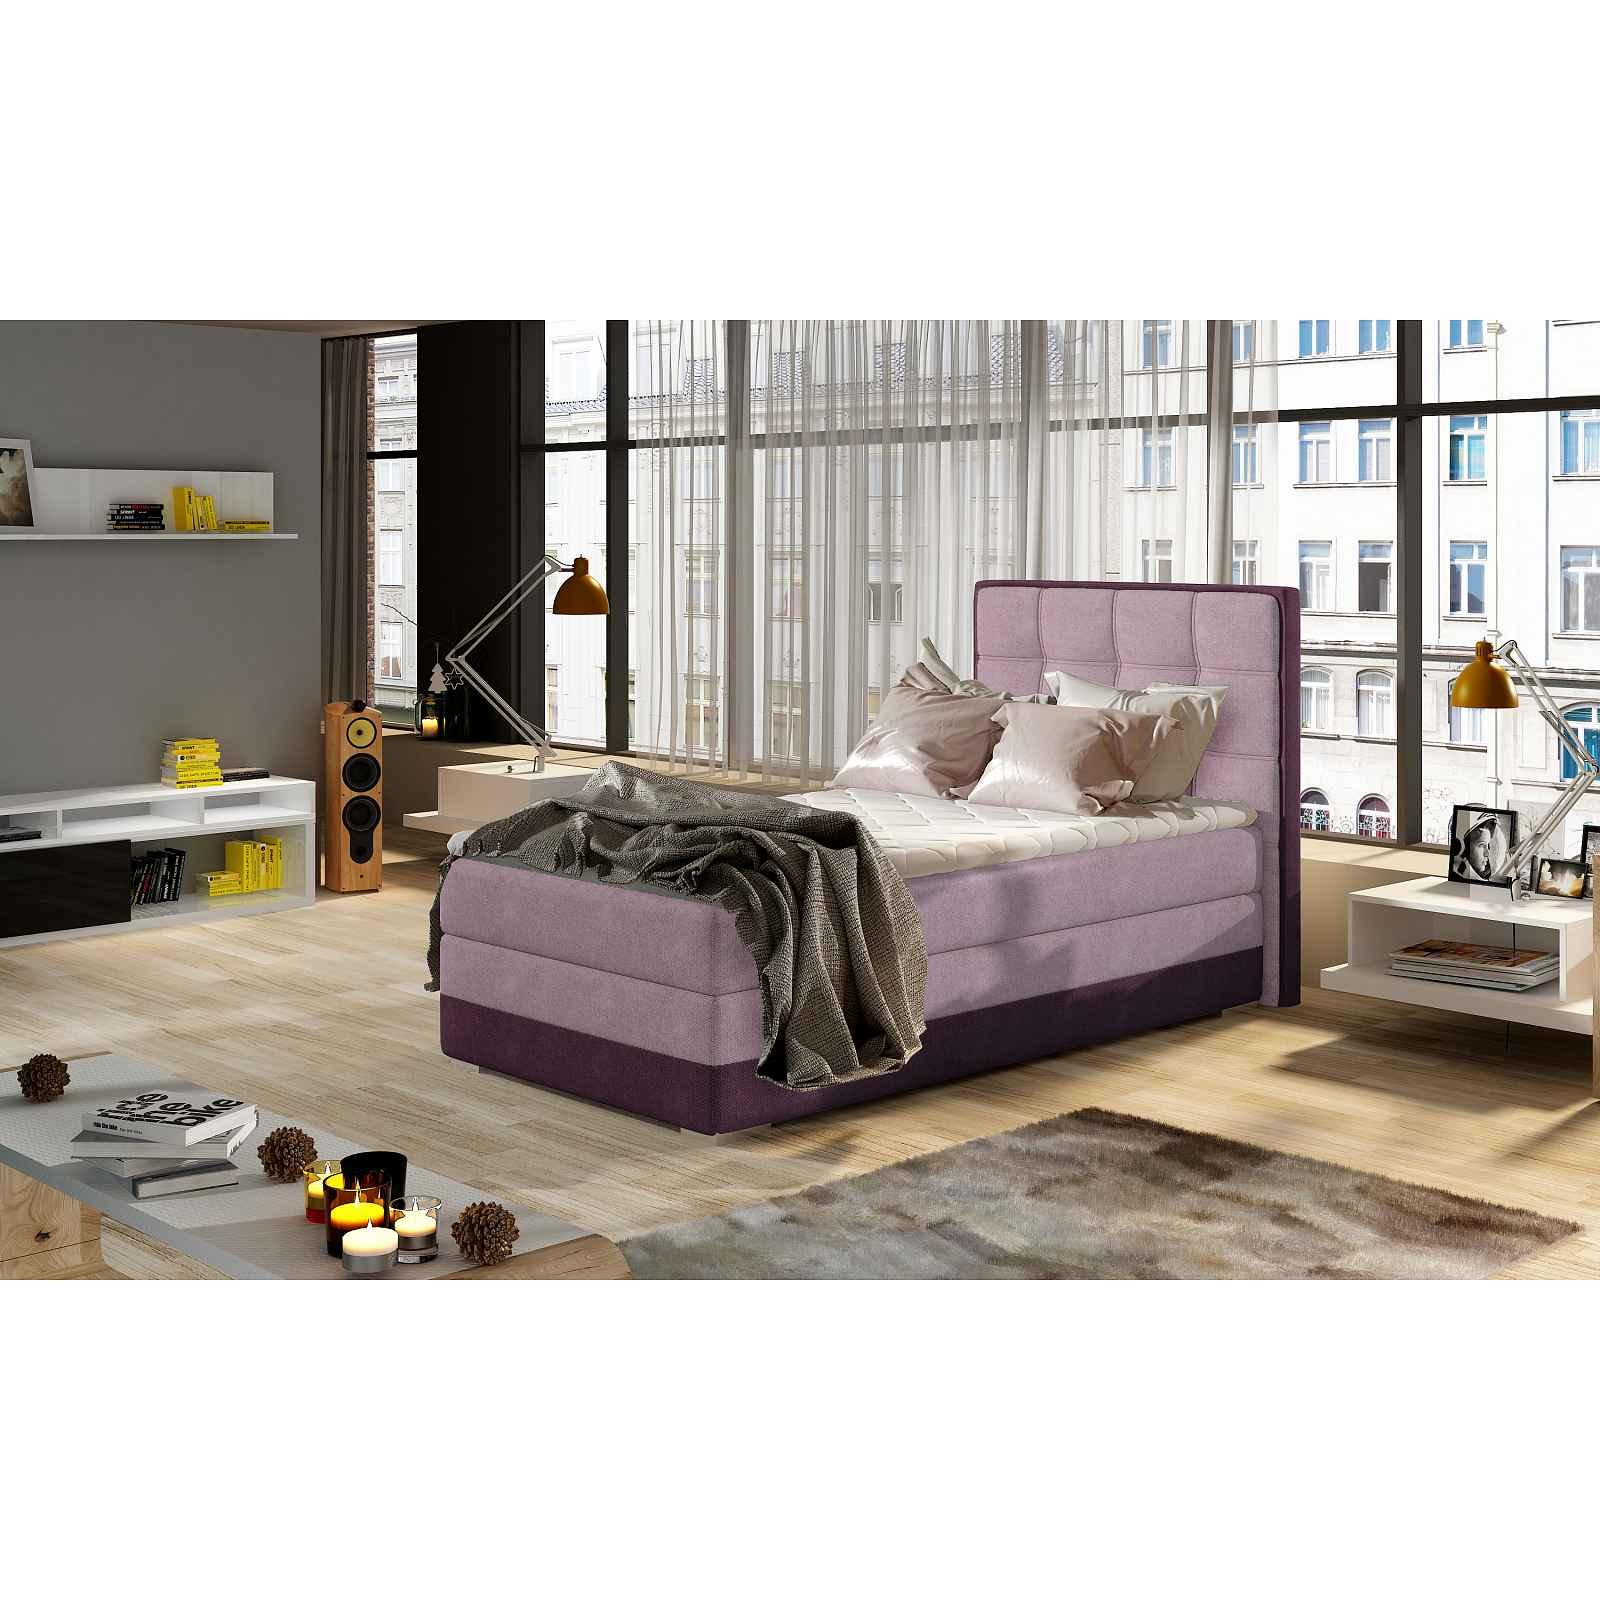 Moderní box spring postel Adria 90x200, fialová  Roh: Orientace rohu Pravý roh HELCEL